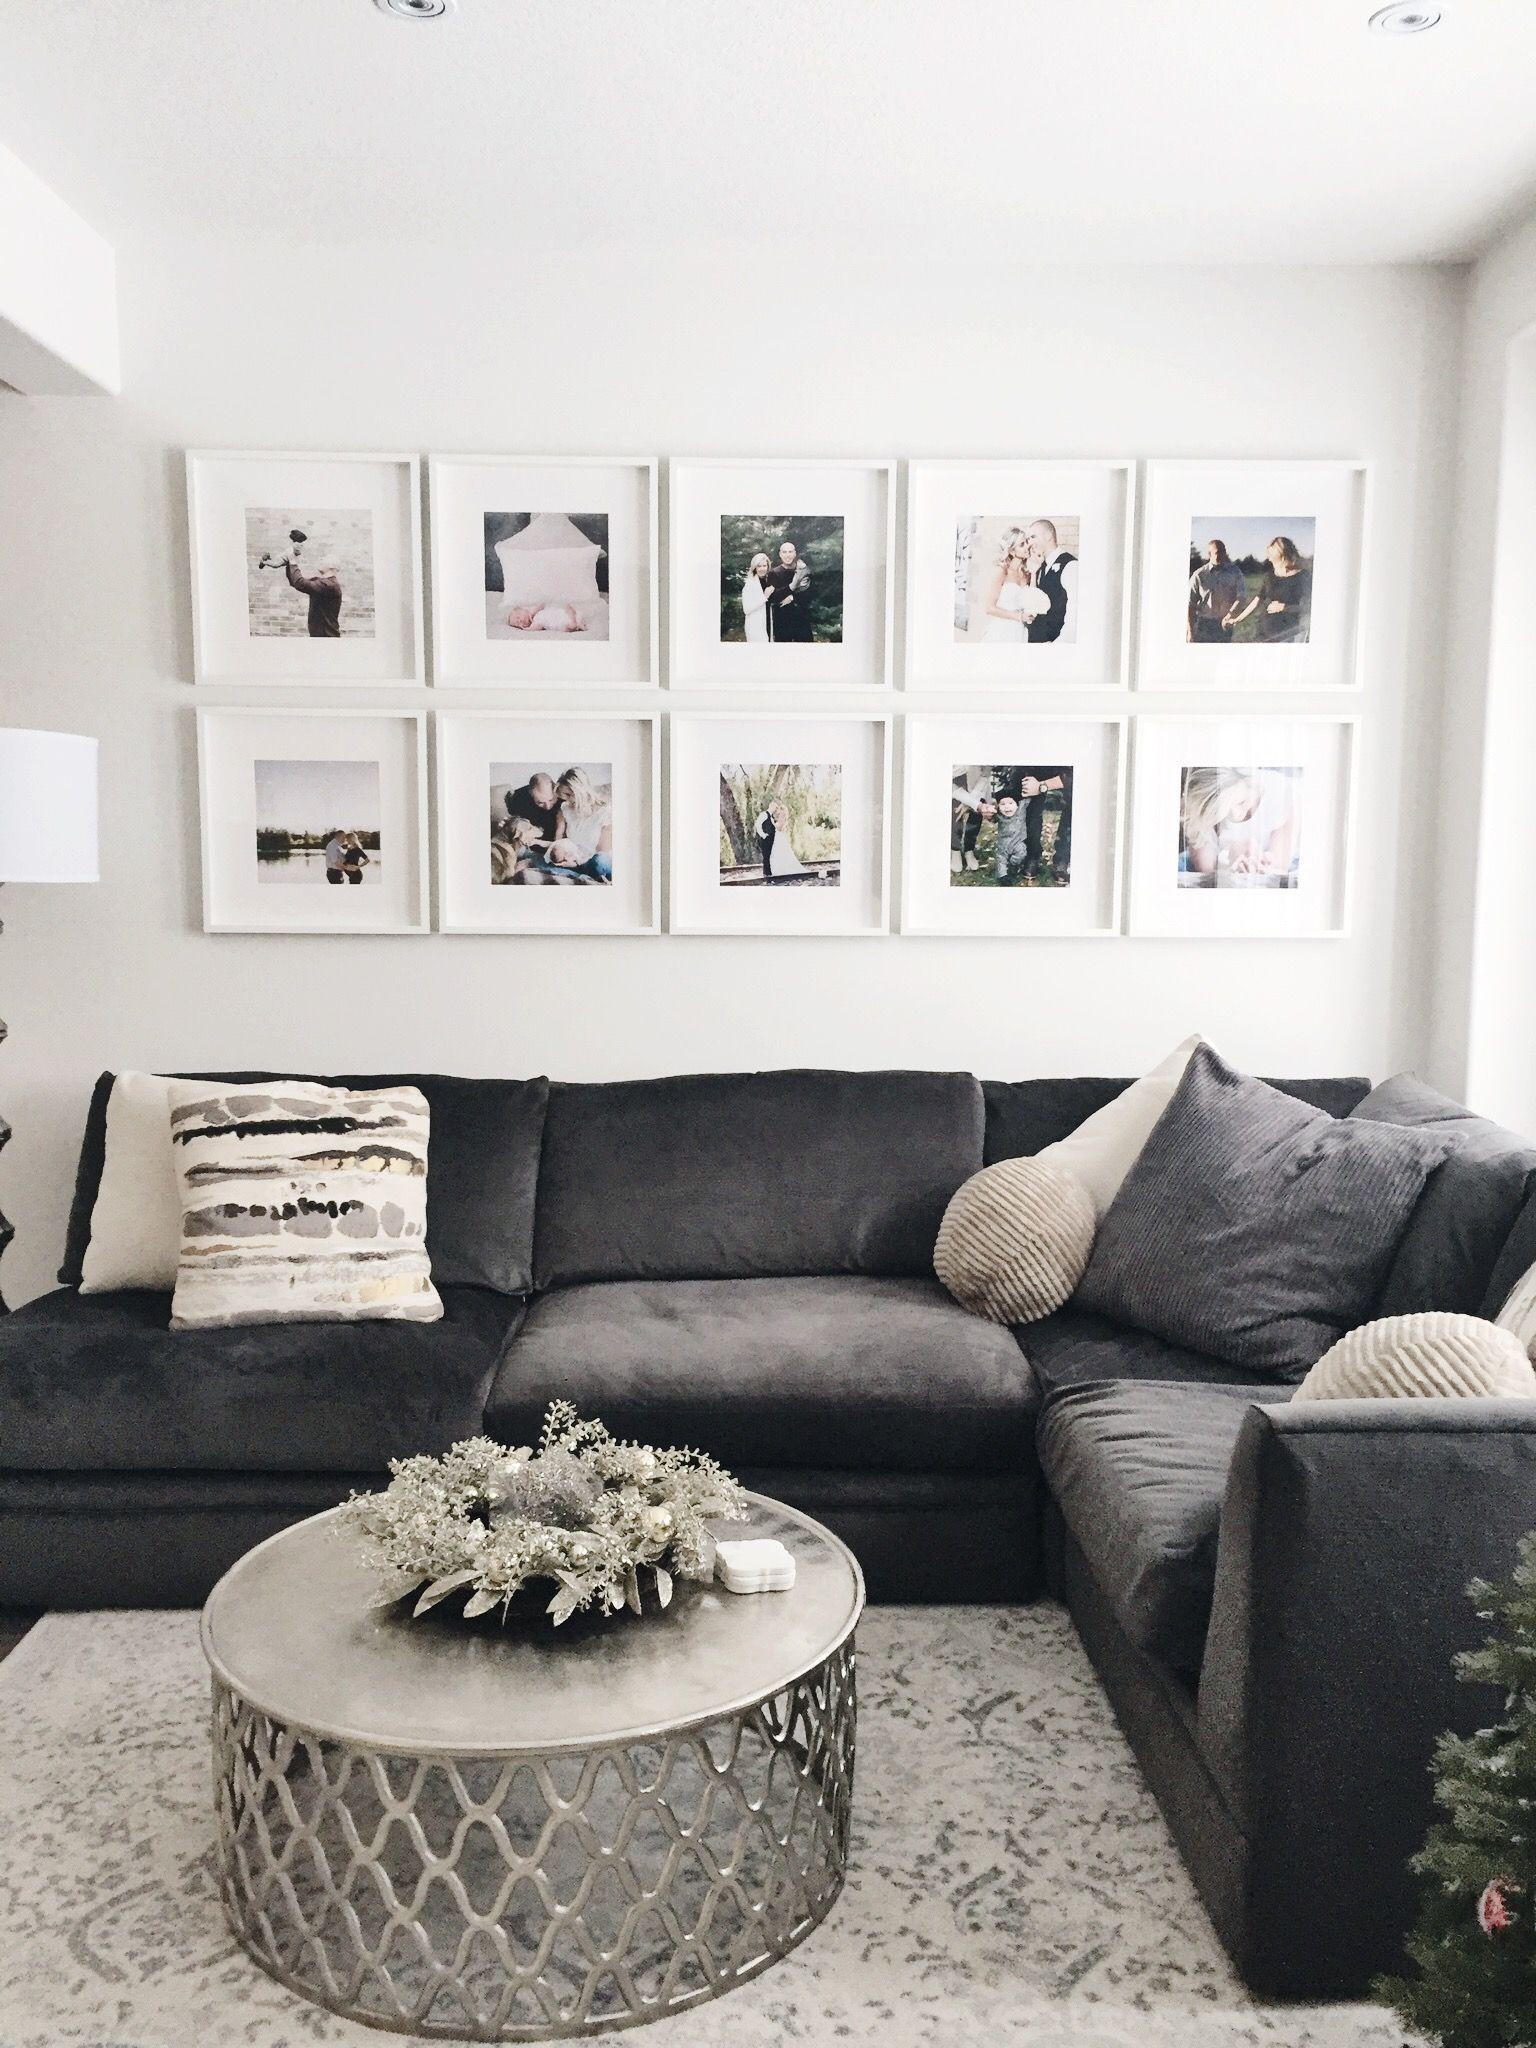 Wall Ribba Ikea Frames Modern Design